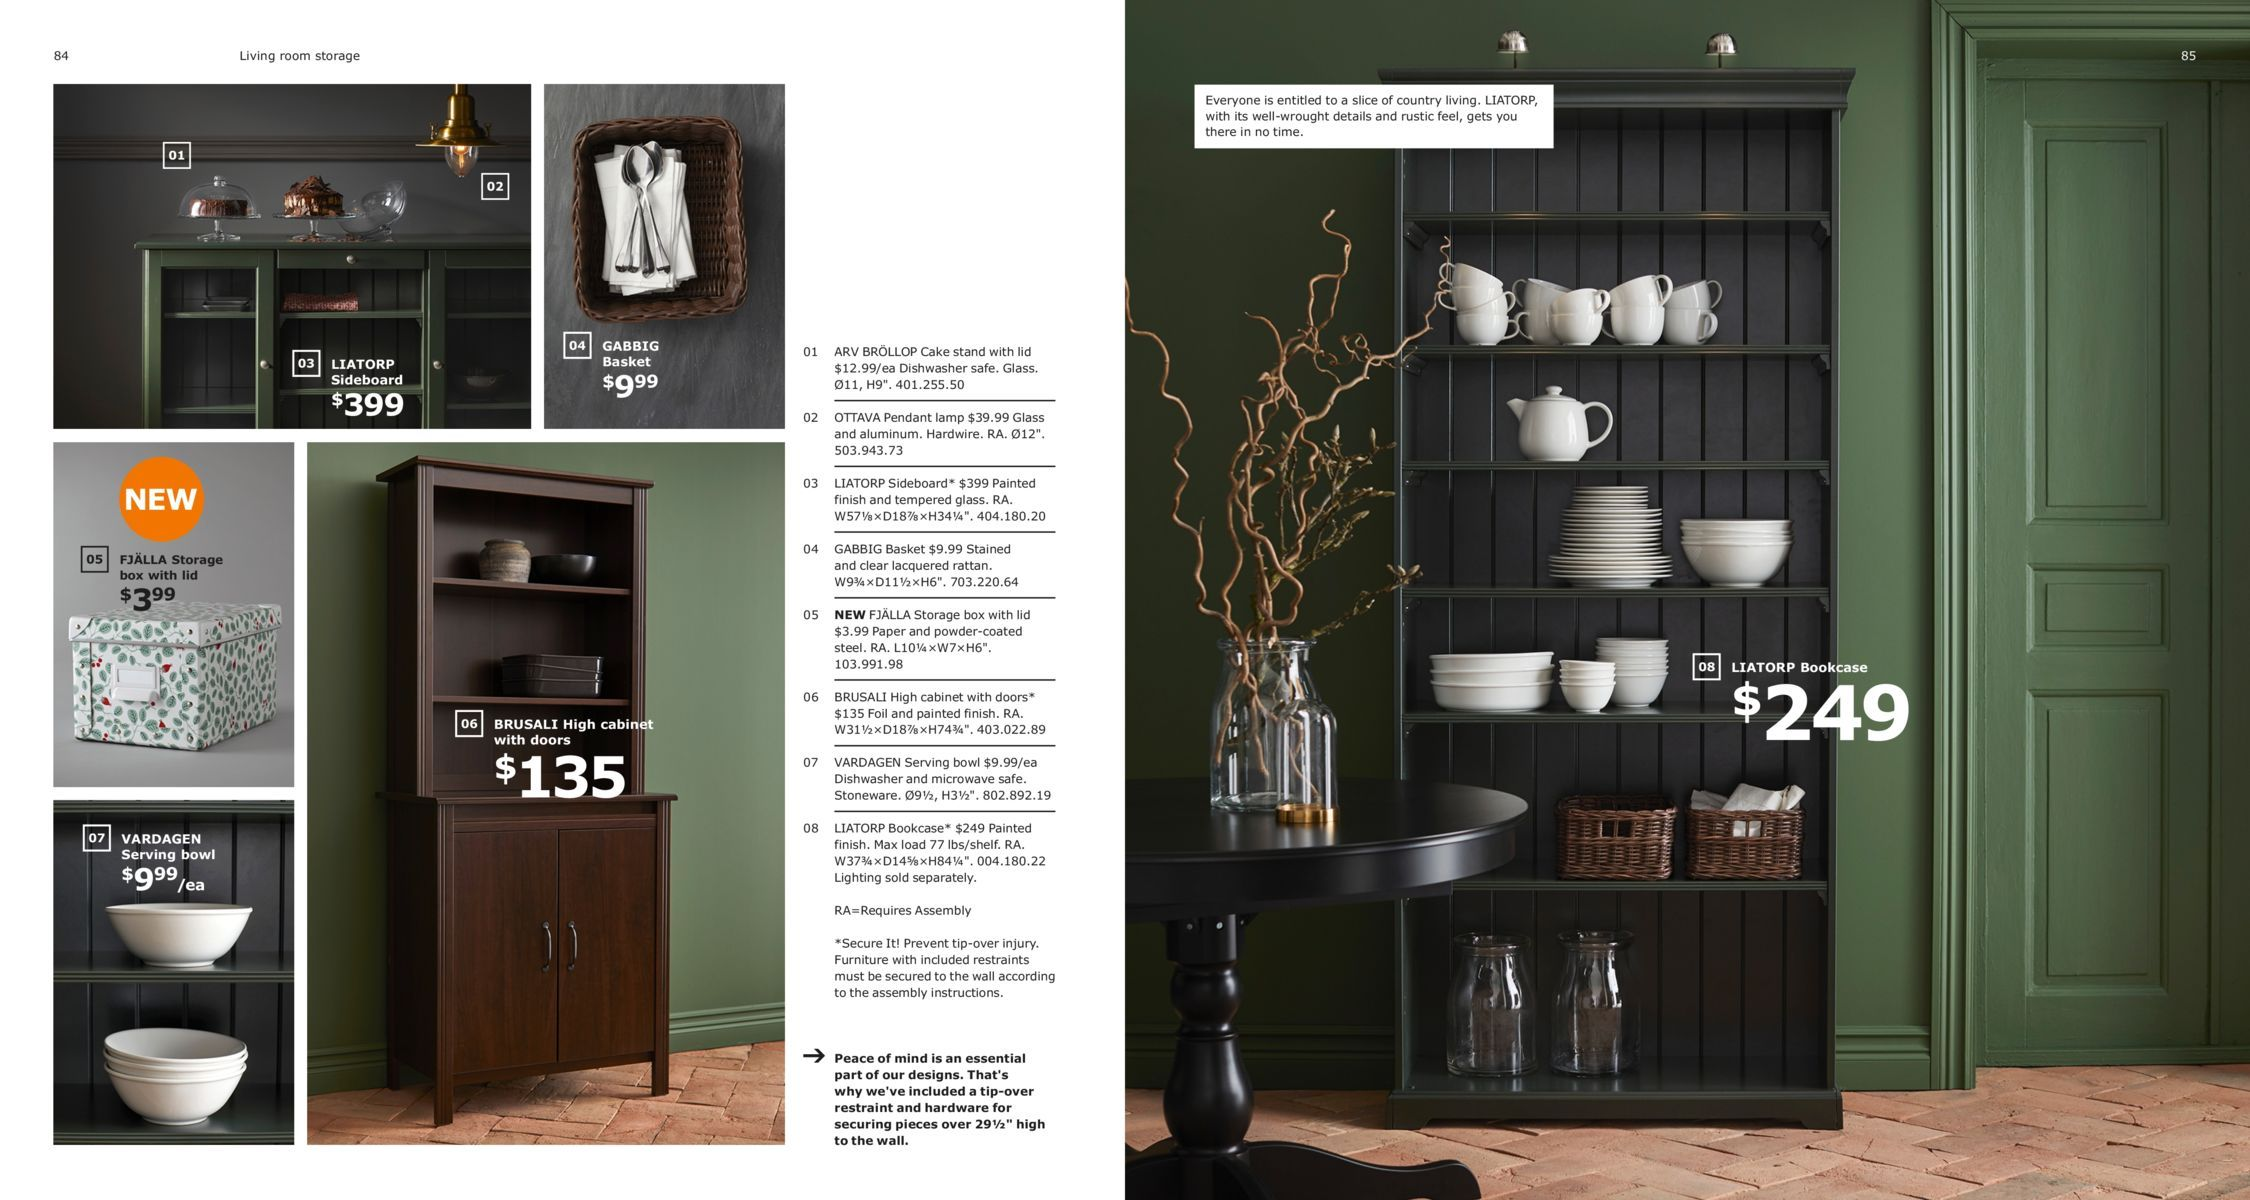 living room storage  2019 ikea catalog  ikea catalog